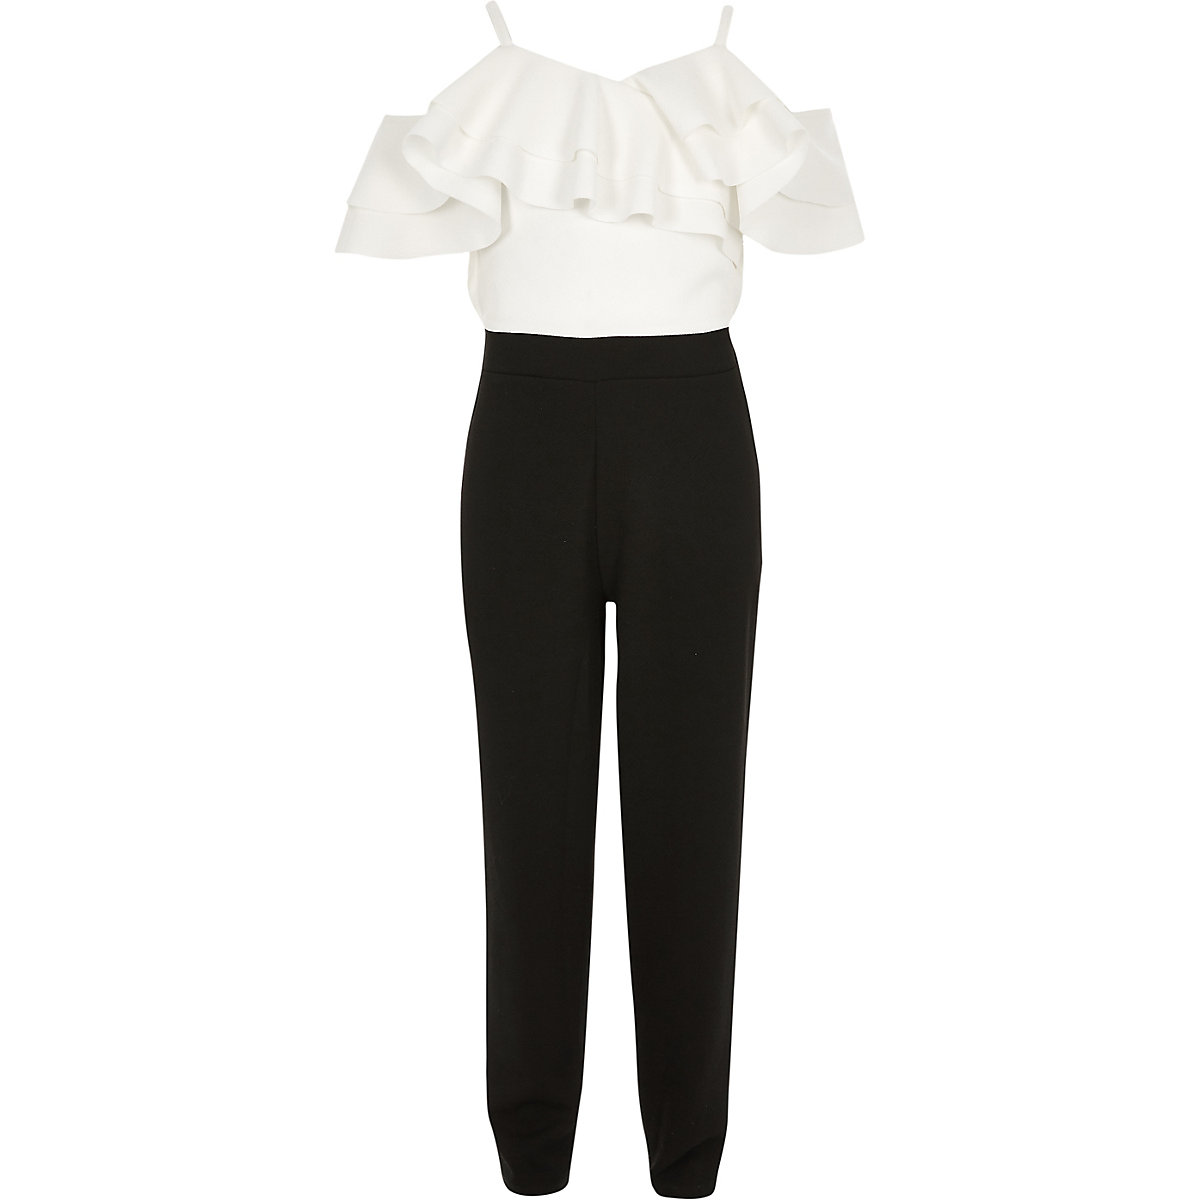 Girls white and black frill bardot jumpsuit